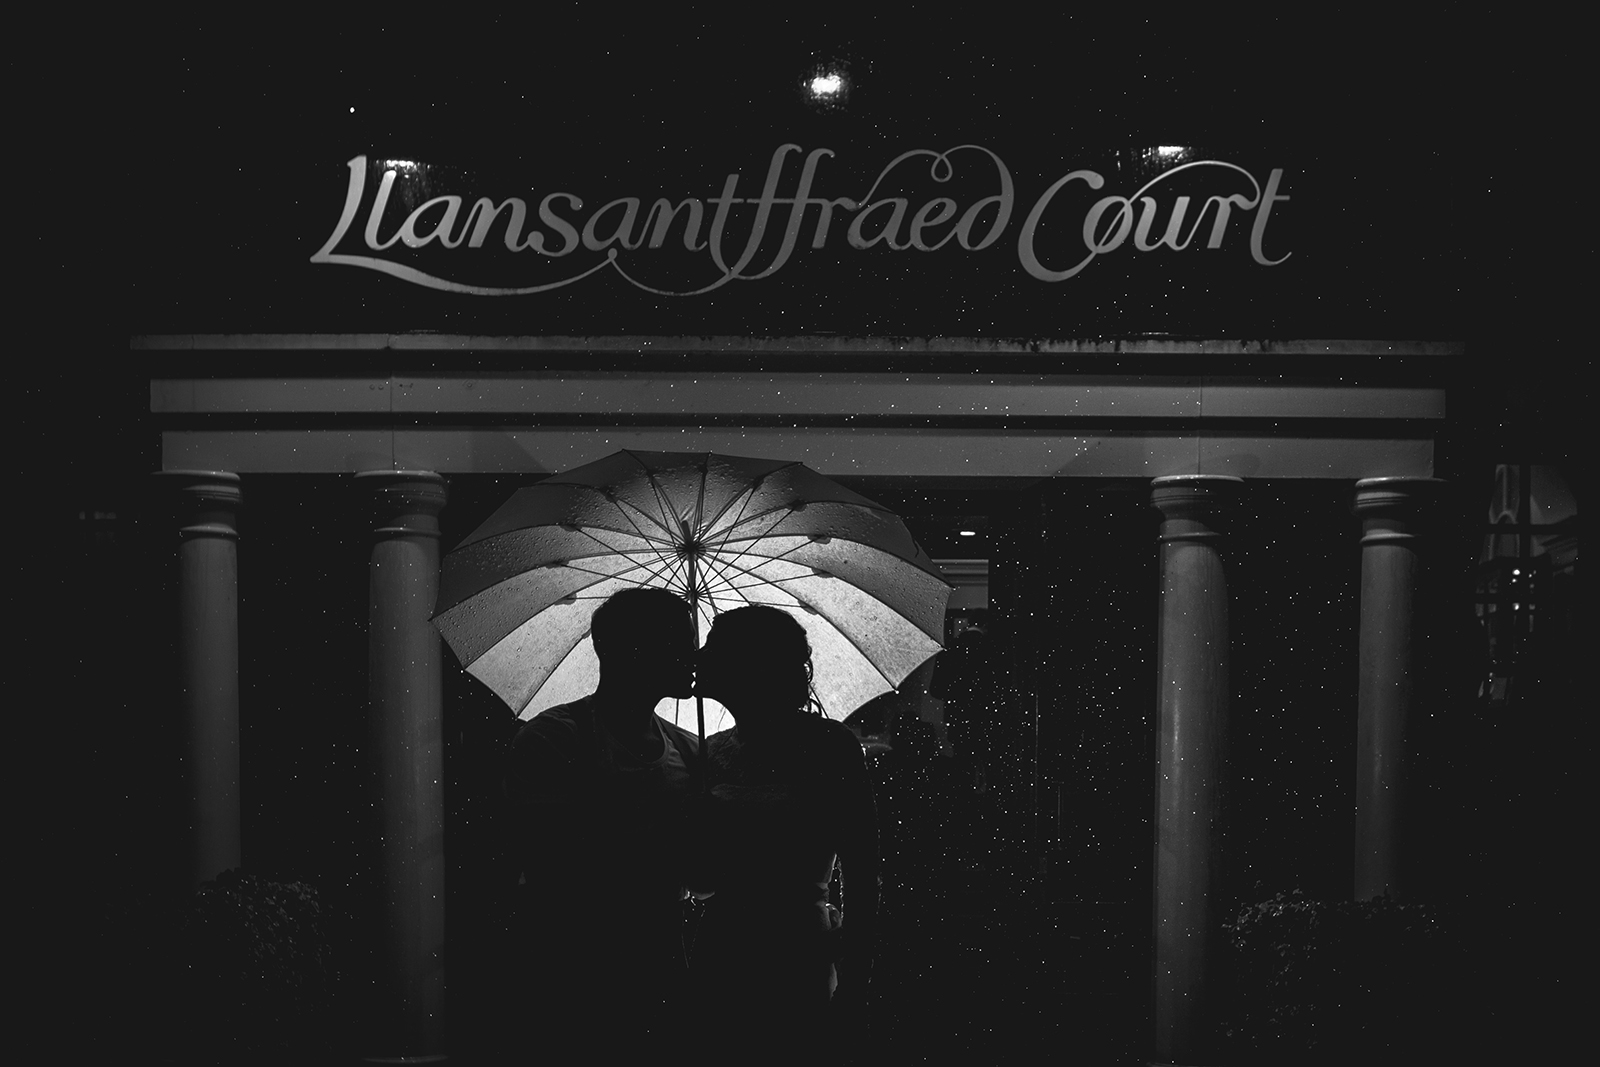 wedding photographer llansantffread court